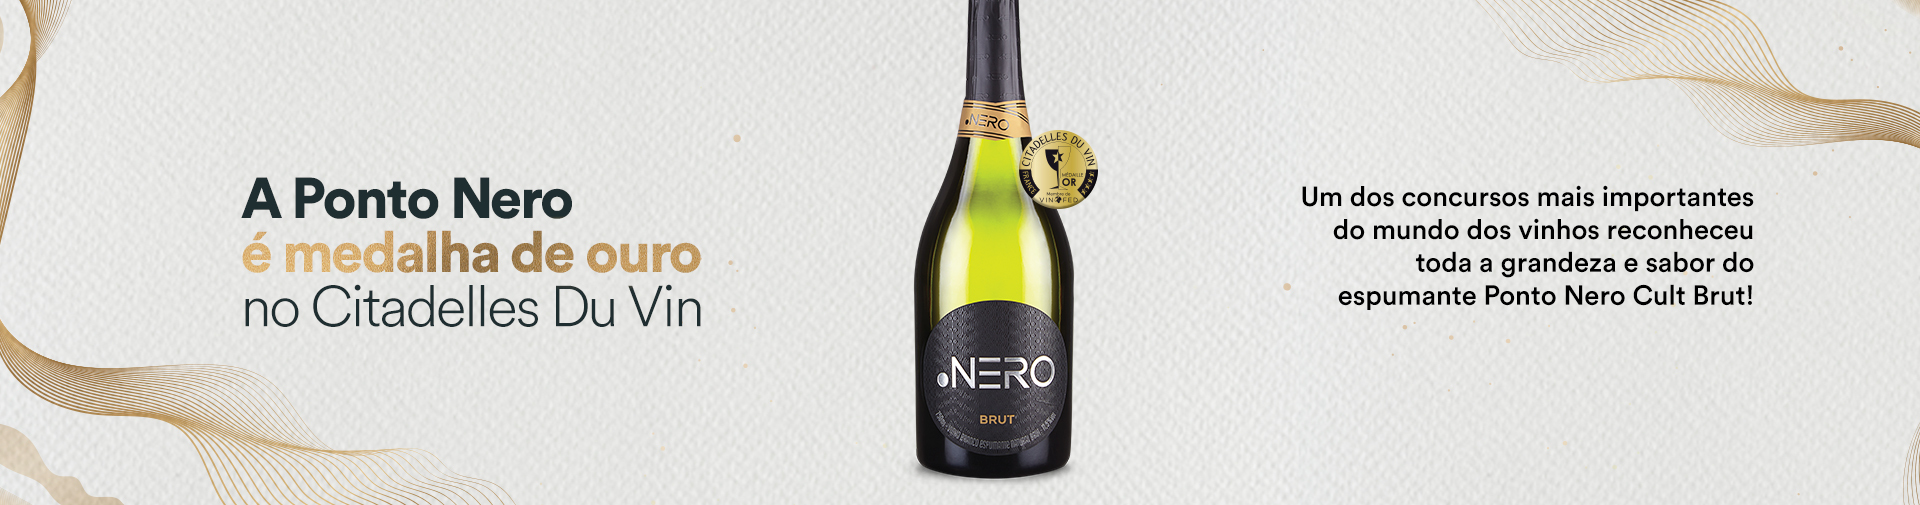 Ponto-Nero---Banner-Site-1920x505px.jpg